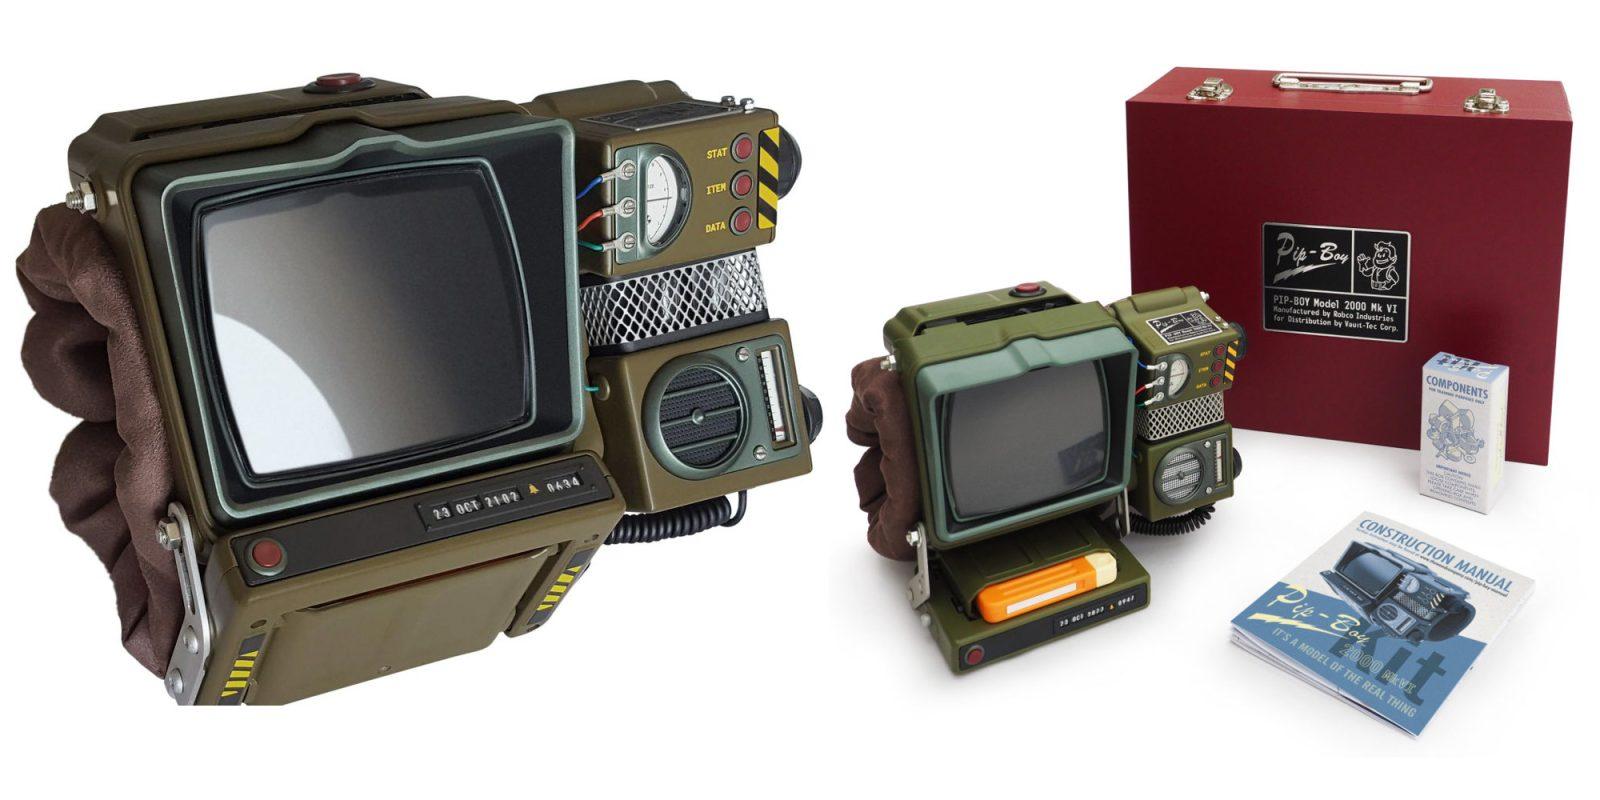 Fallout 76 on Flipboard by Richard | Gaming (UK), PlayStation